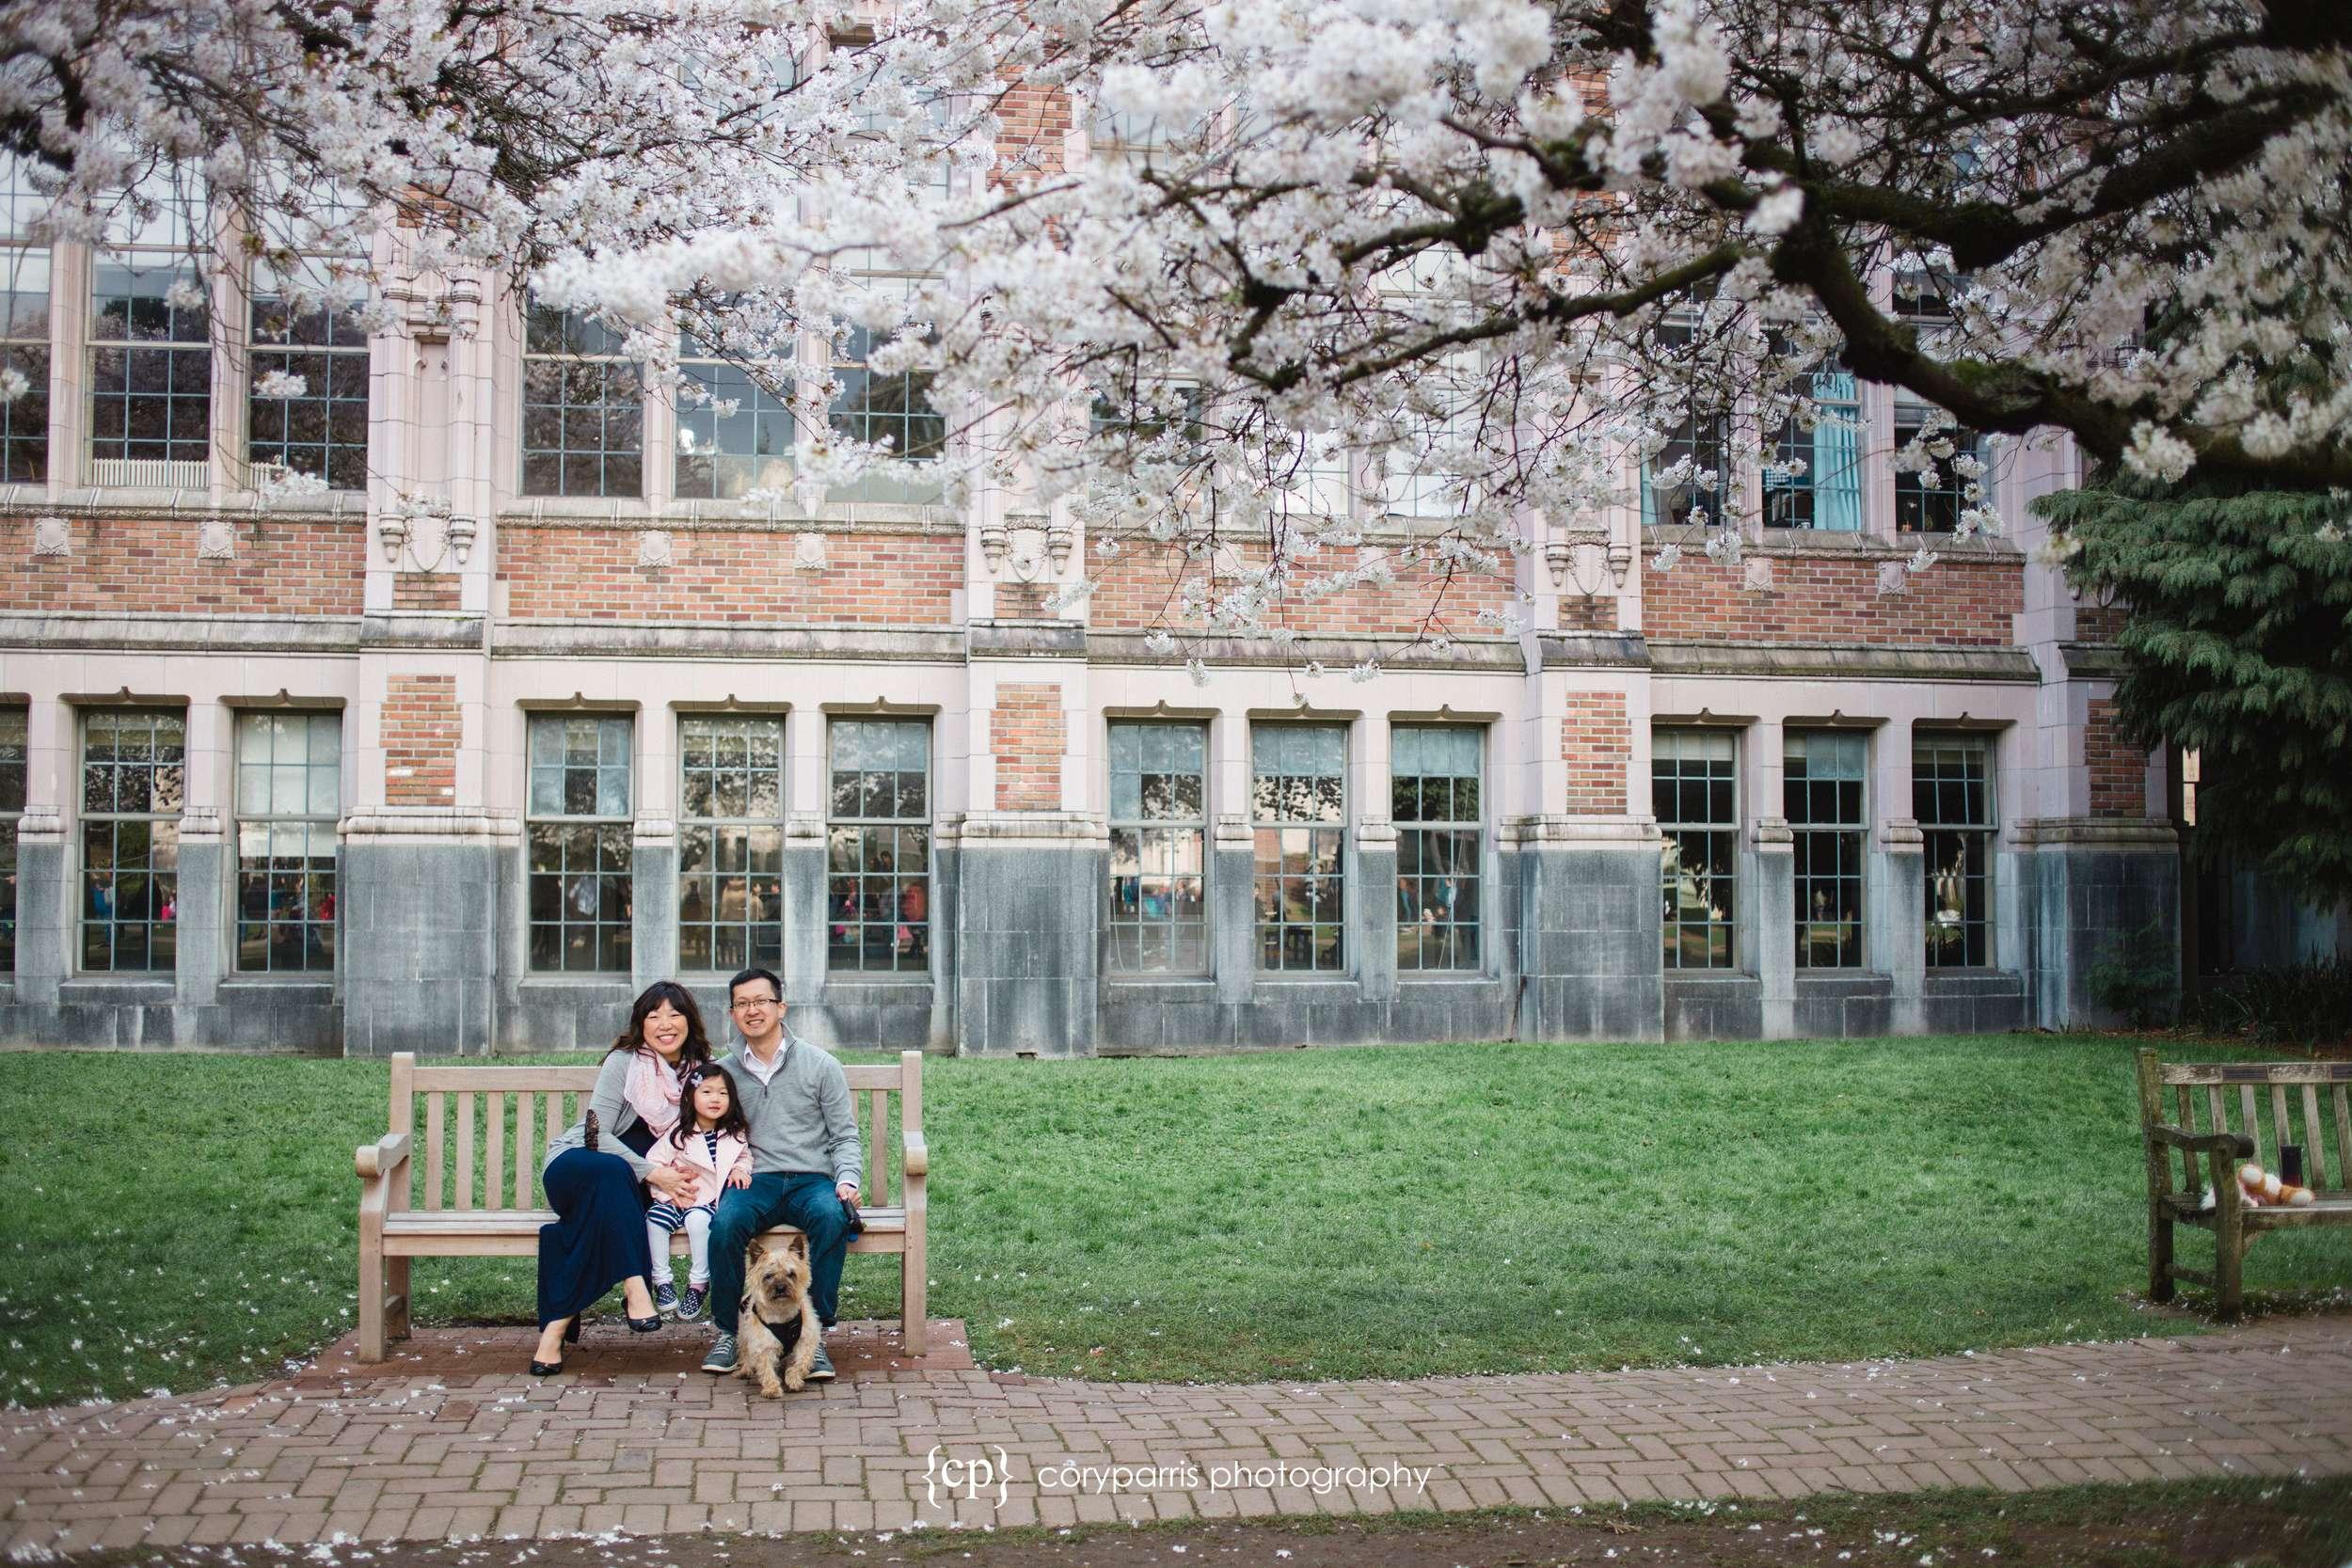 Family portrait on the Quad at UW